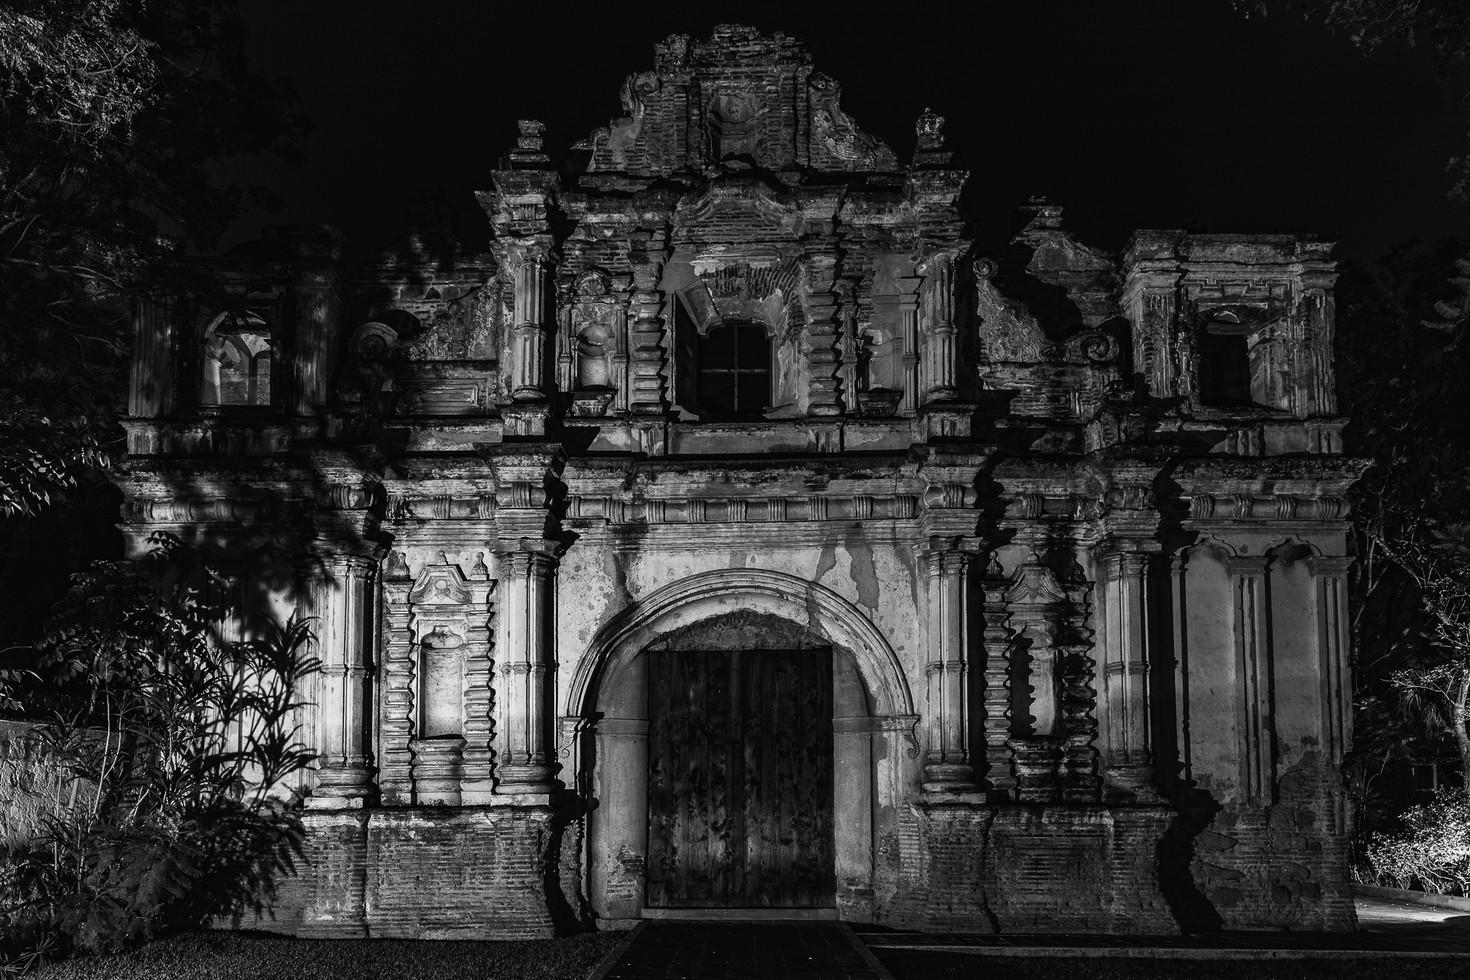 TKPA-Antigua201805-0140v01-HDWH.jpg